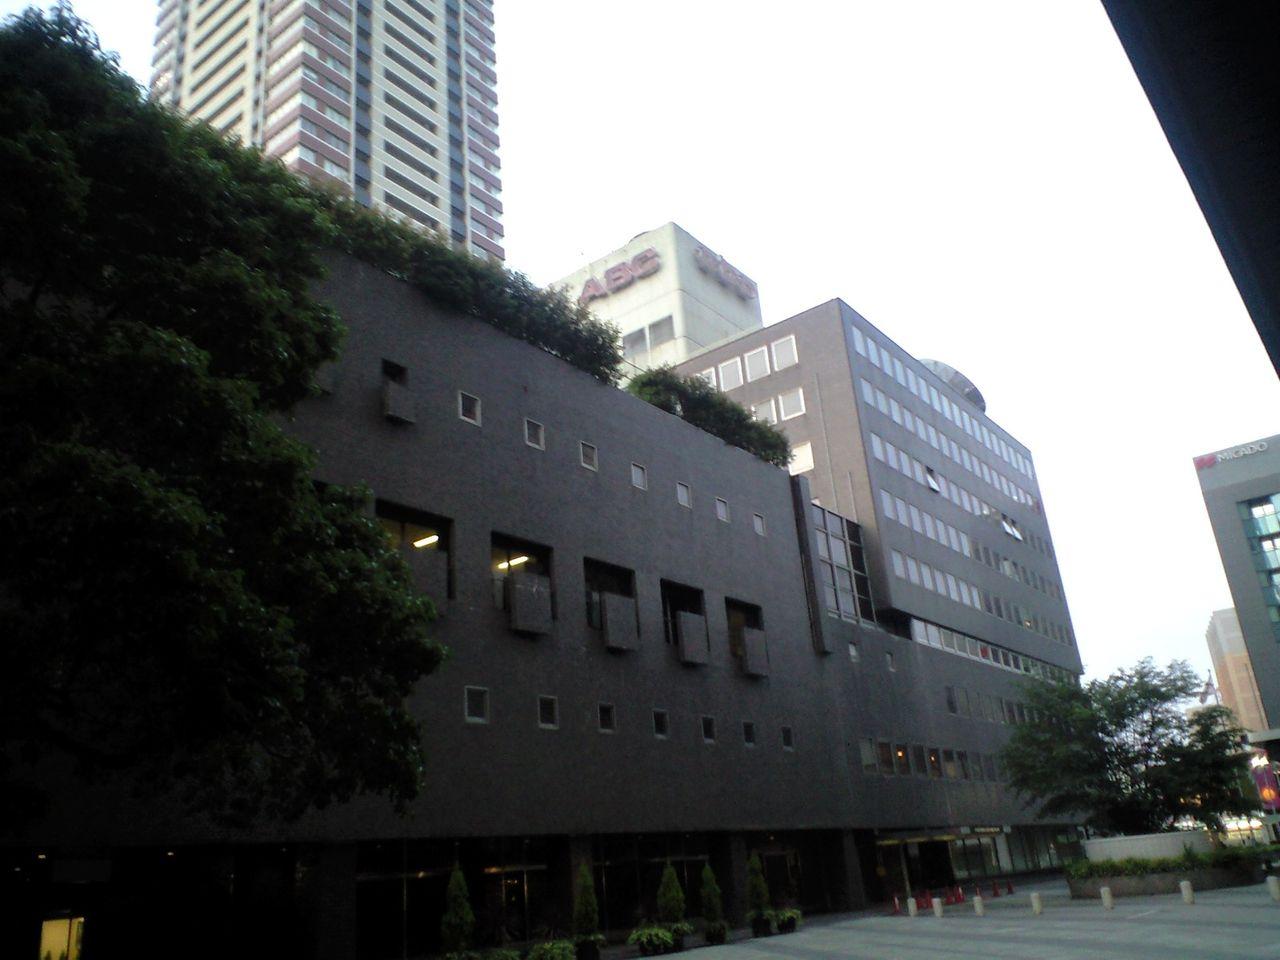 大阪府・朝日放送旧局舎 : tarochan_denpaのブログ